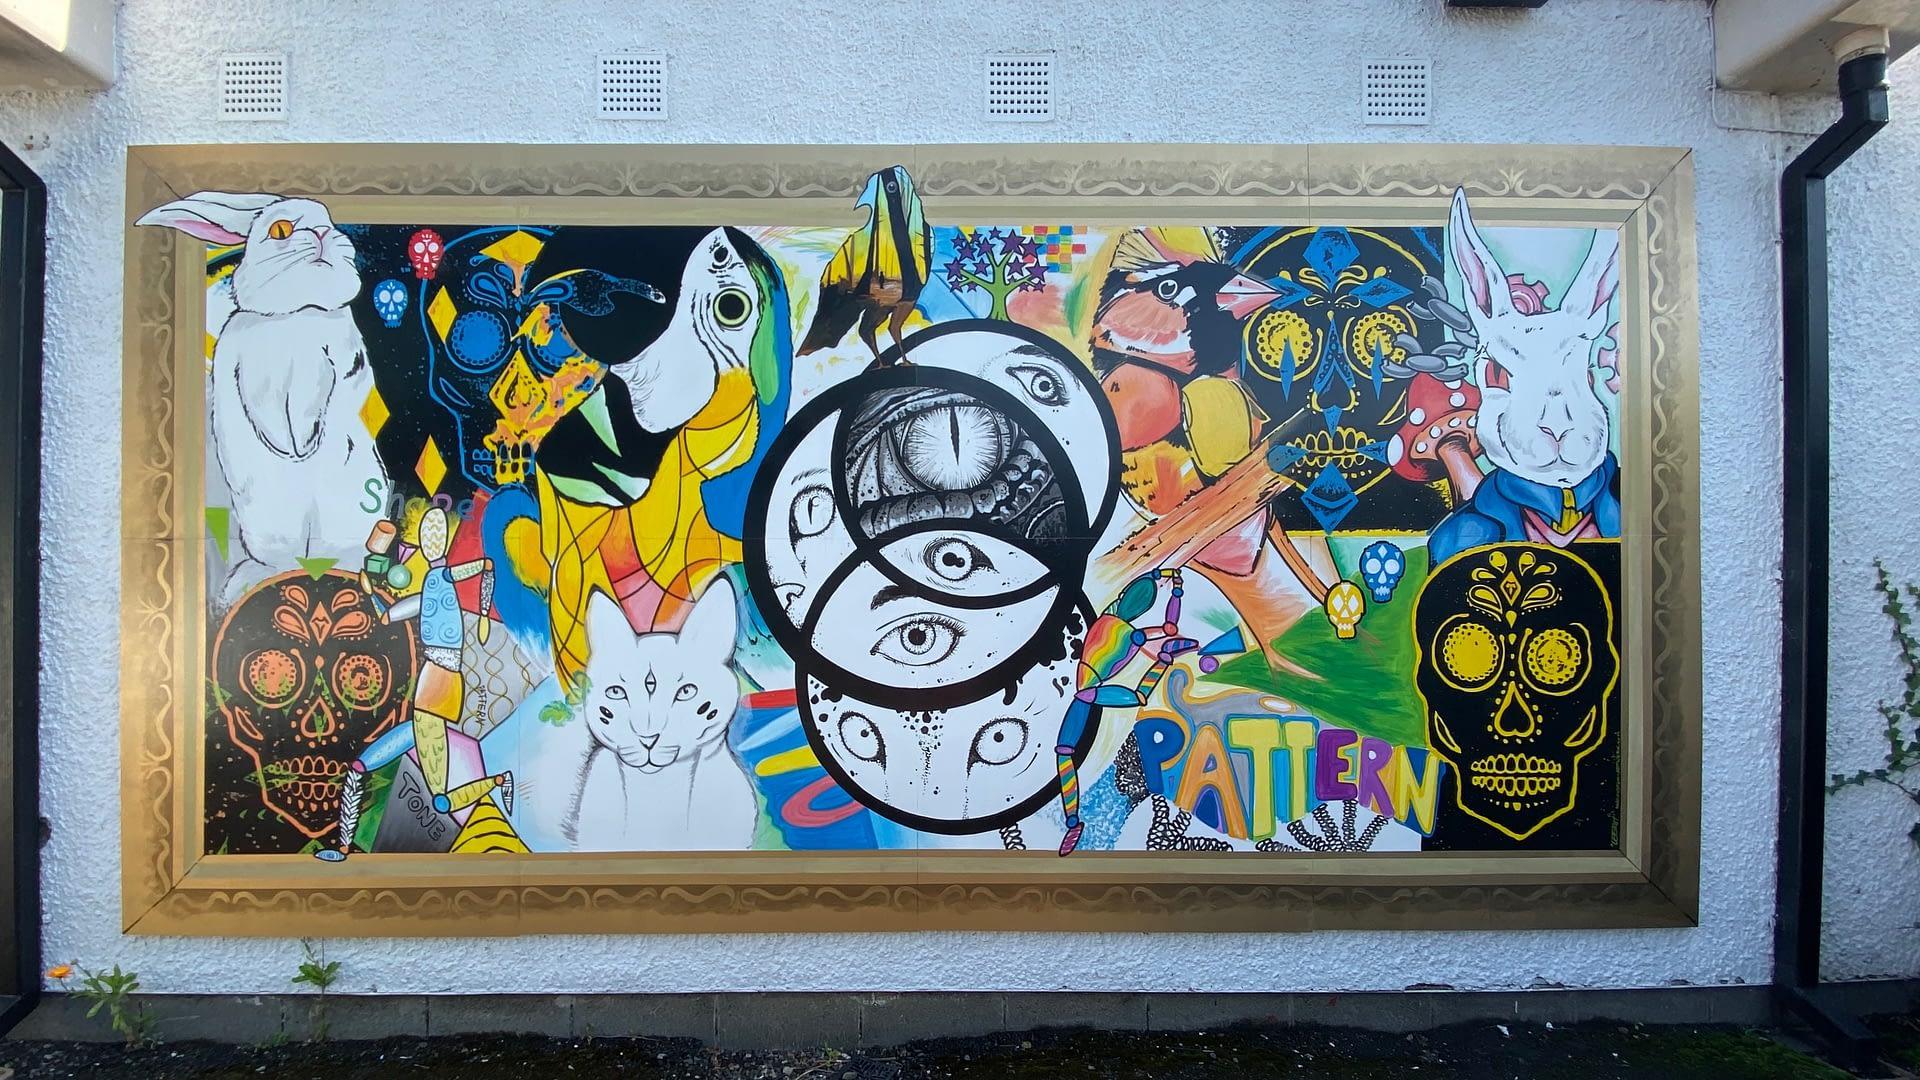 Belmont Pupils artwork Mural